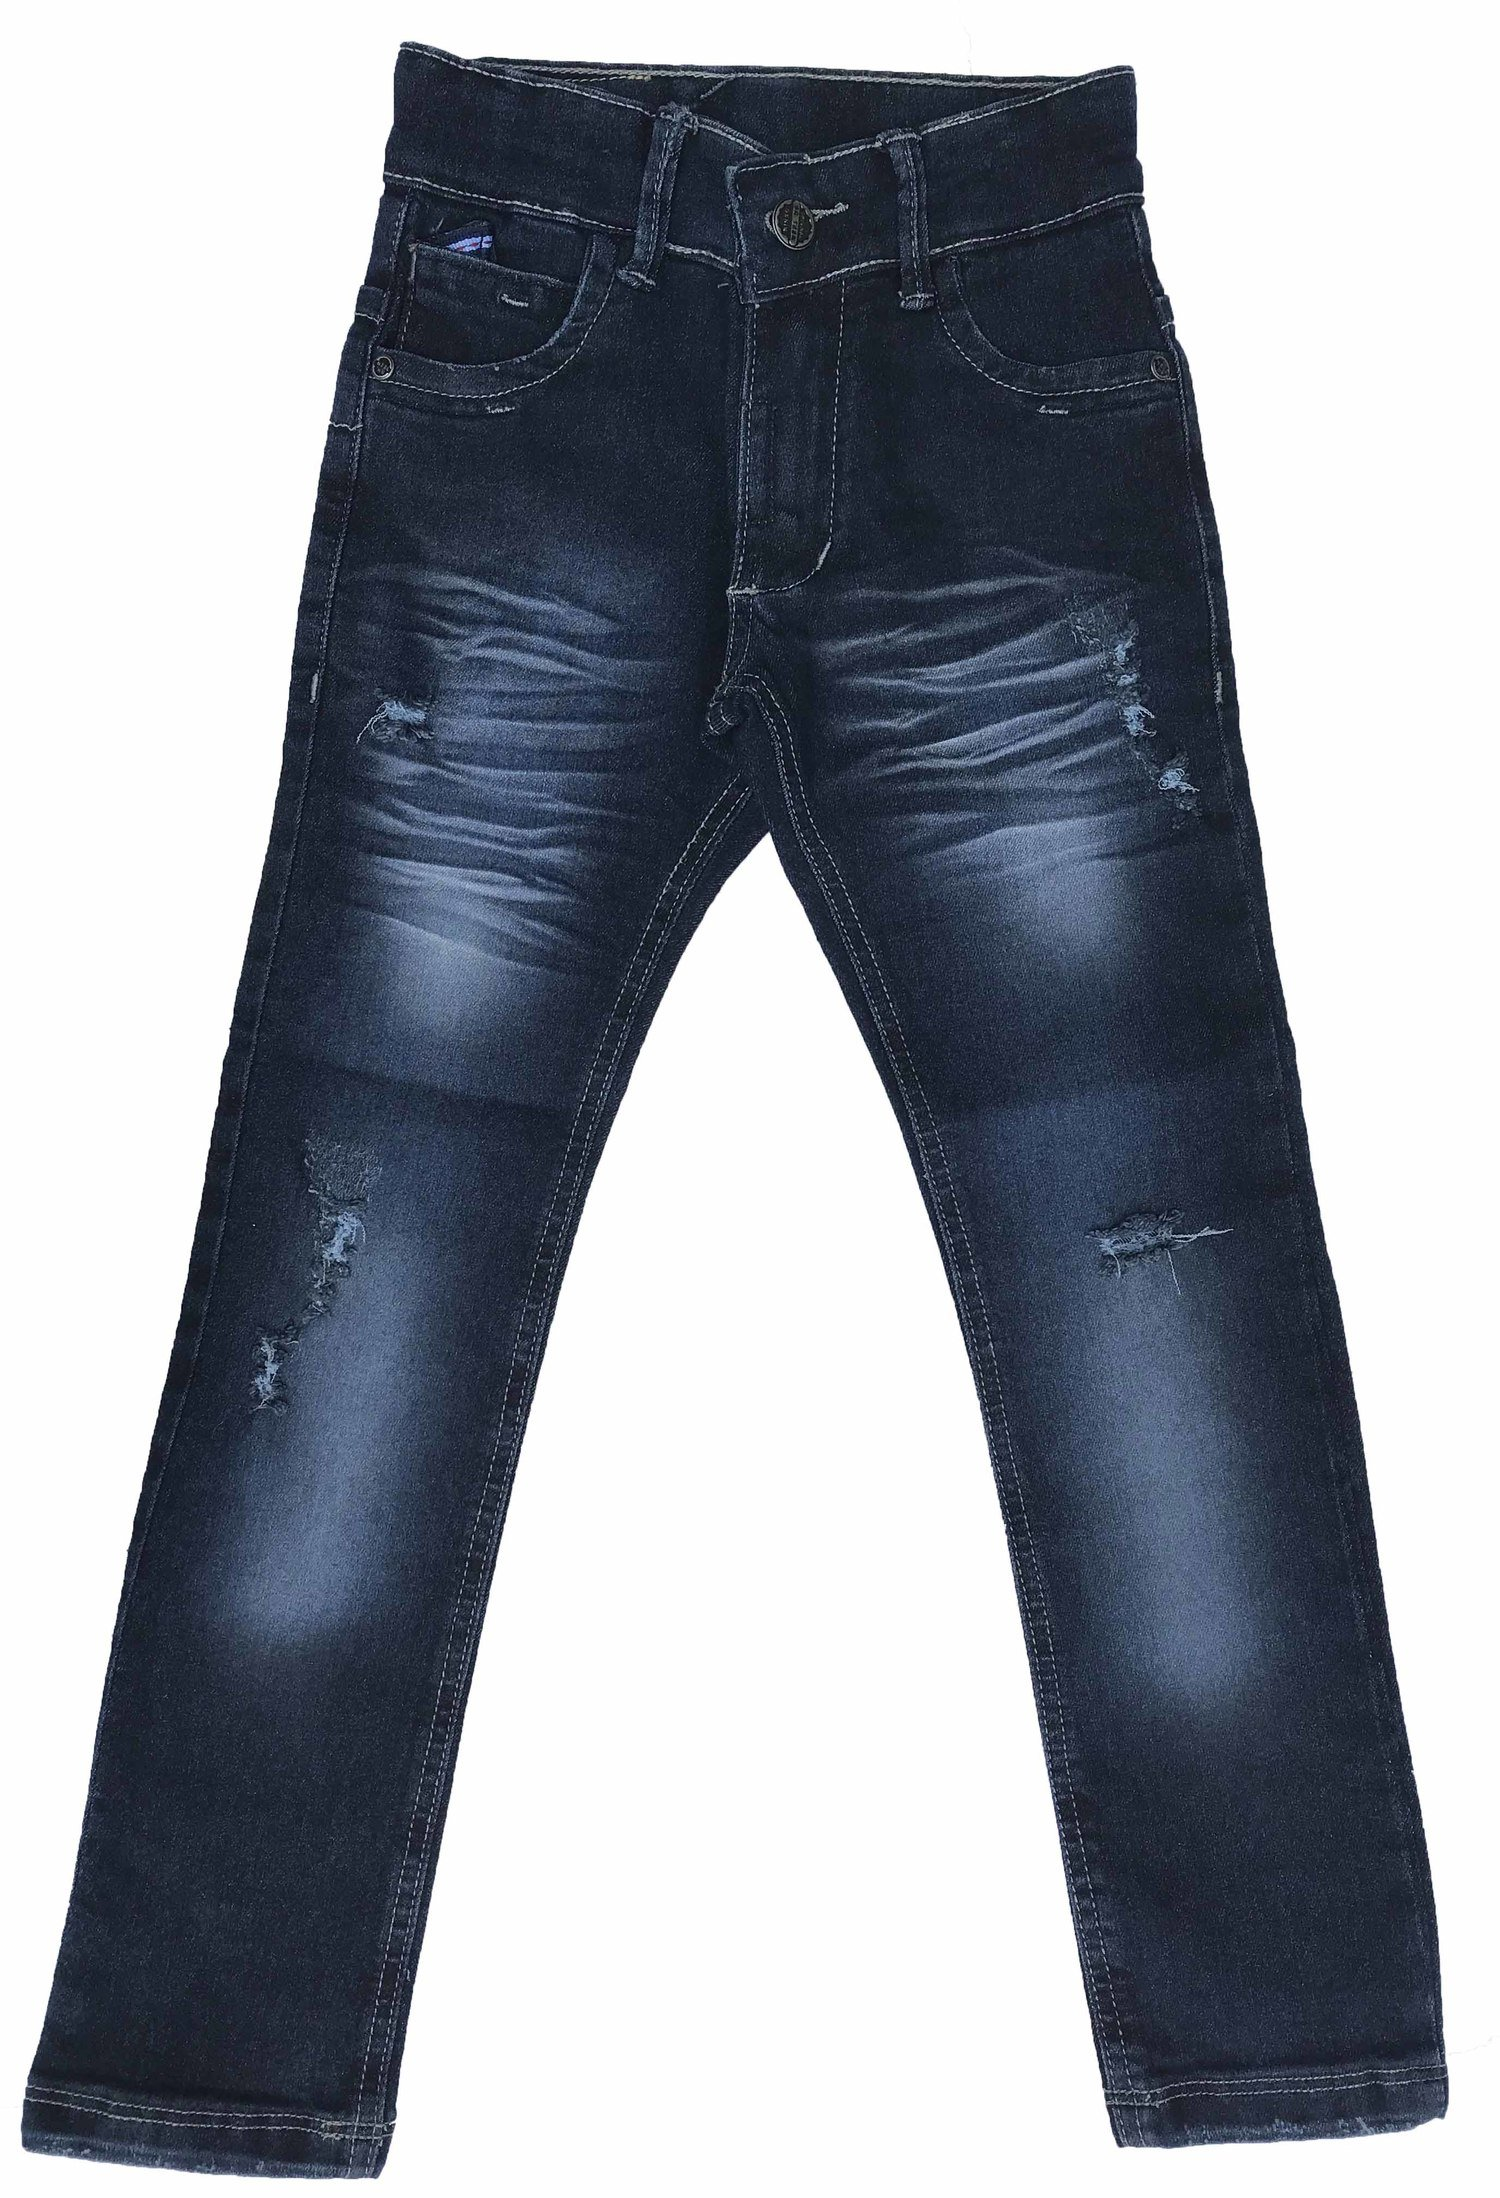 Calça Masculina Infantil Jeans [418]